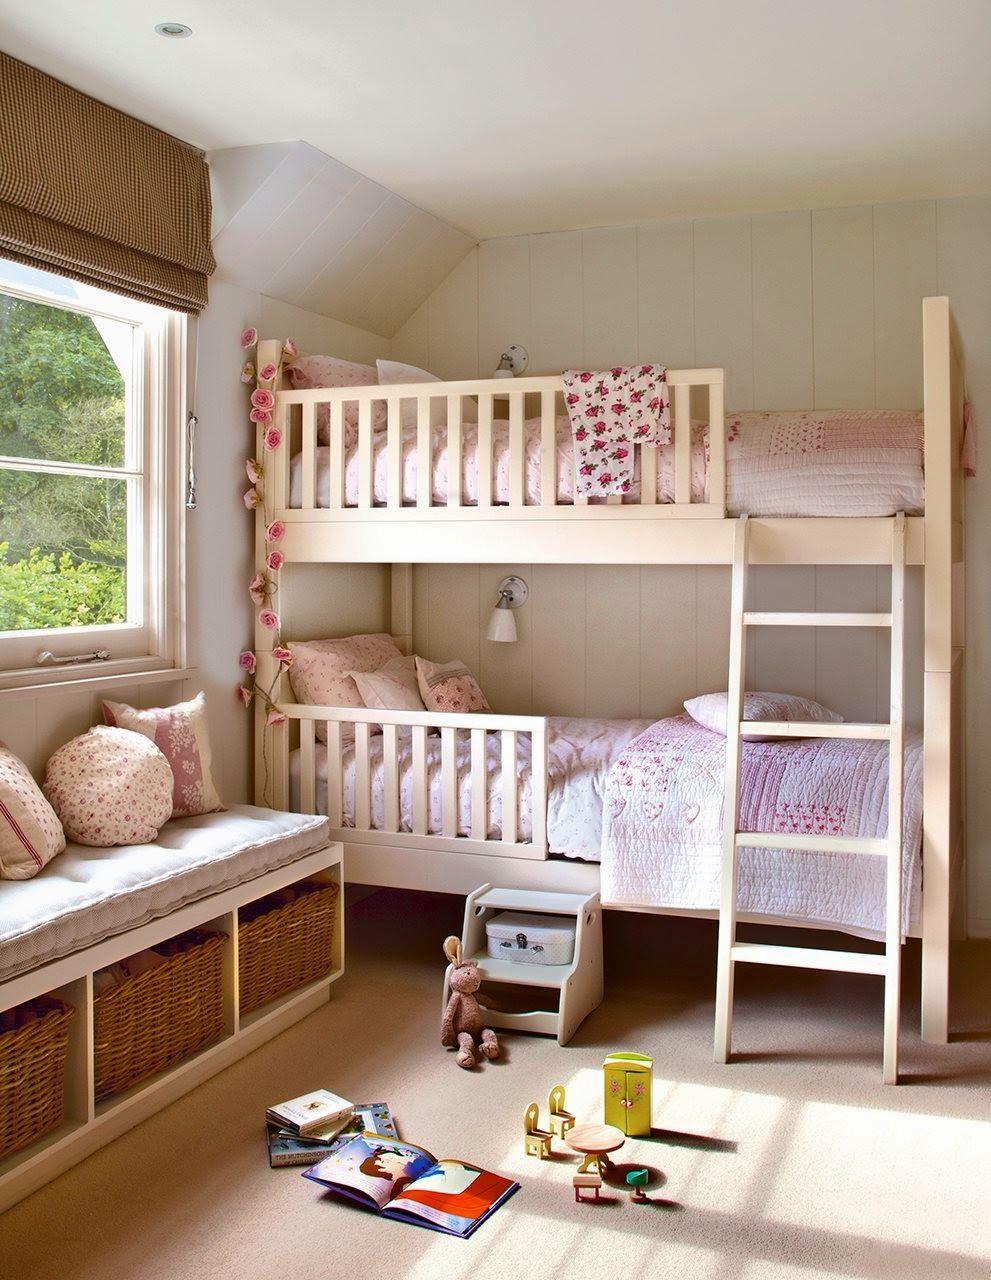 Stebbing House Desing | Dormitorios | Pinterest | Dormitorio